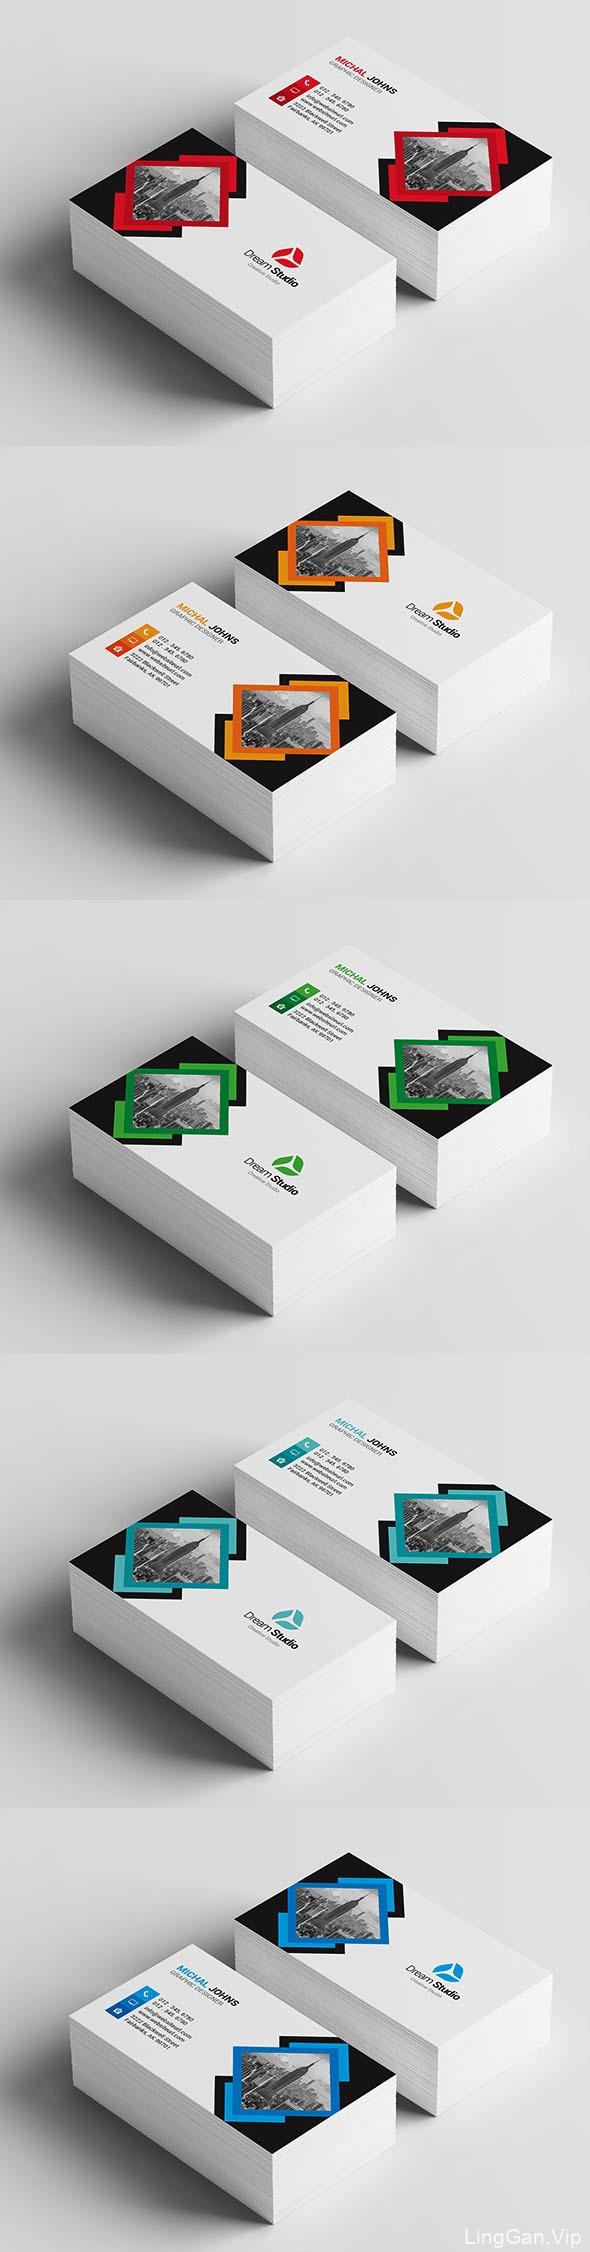 埃及设计师MohamedSalama商务名片模版设计